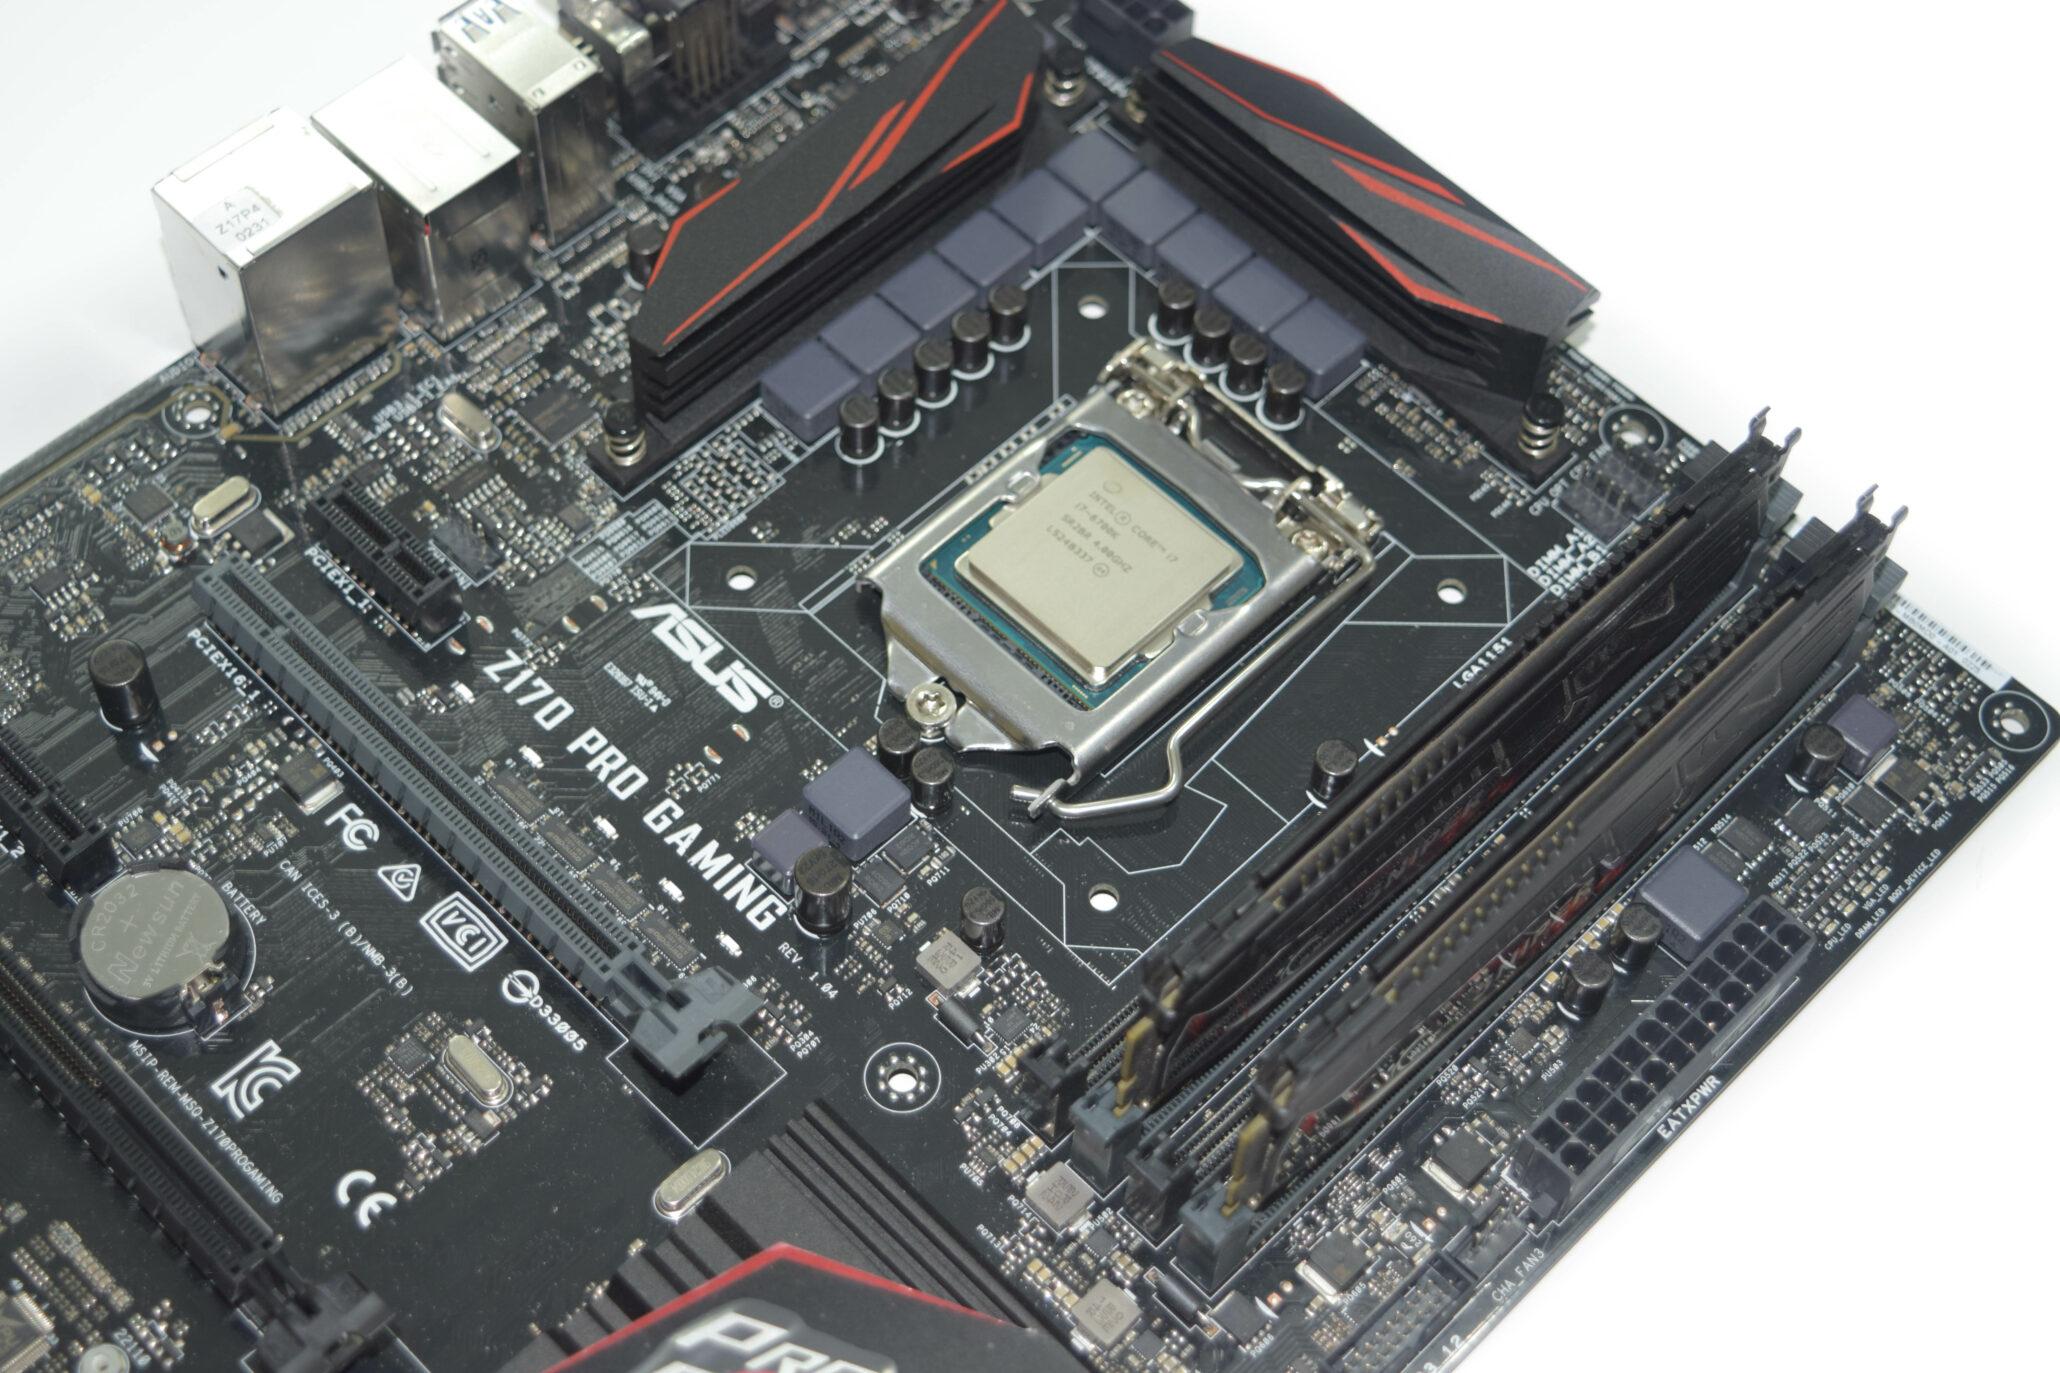 asus-z170-pro-gaming-motherboard_1